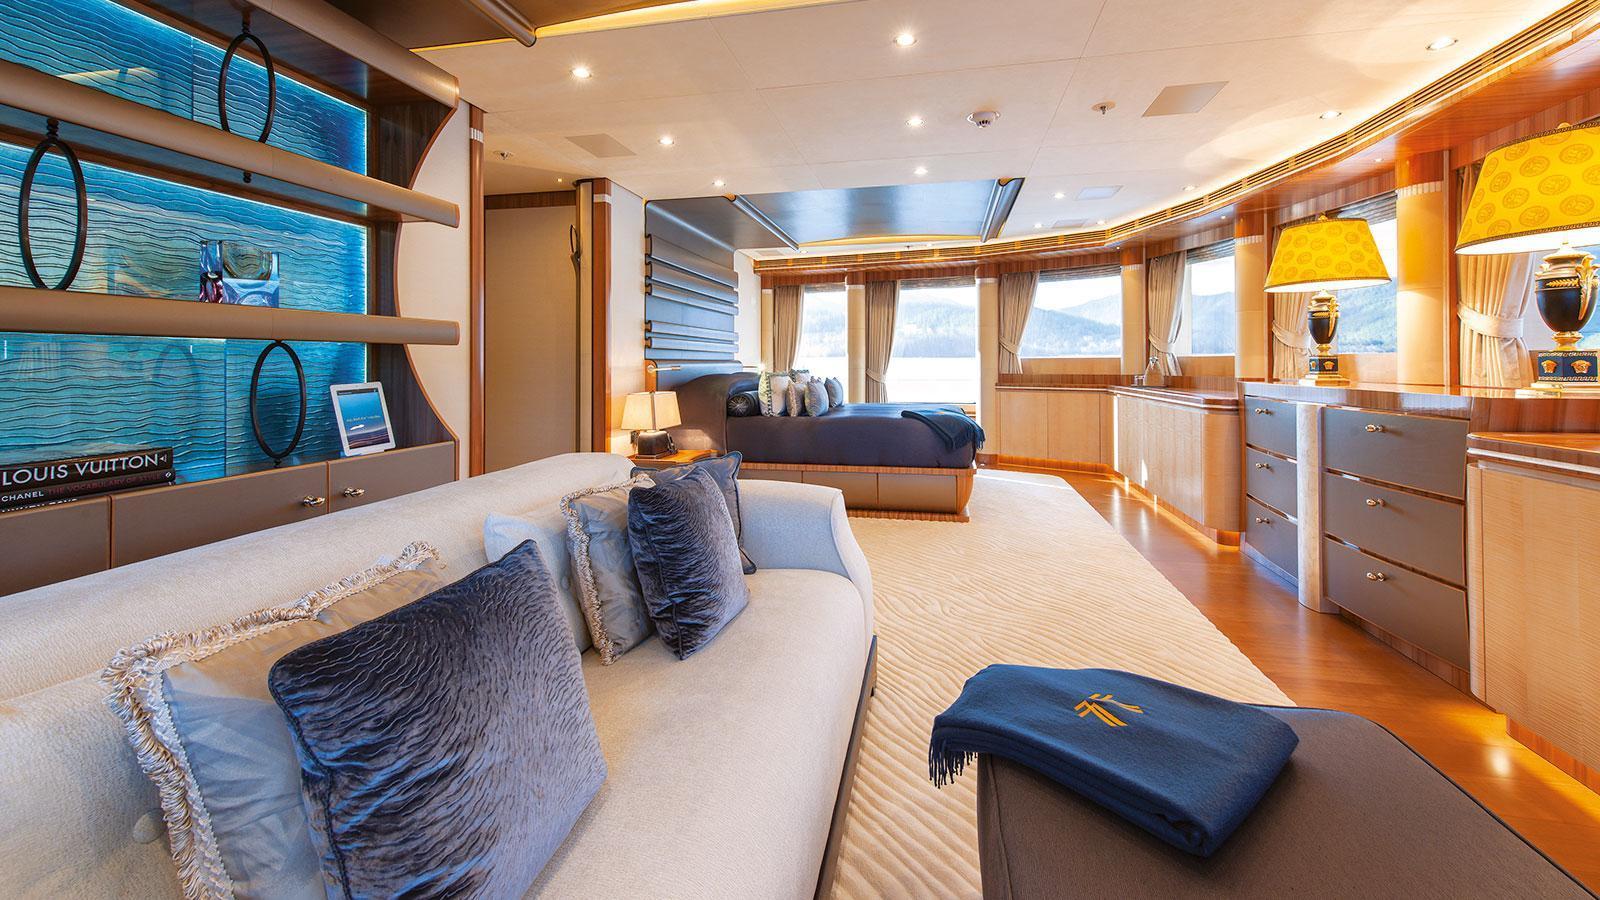 quattroelle-motor-yacht-lurssen-2013-86m-master-suite